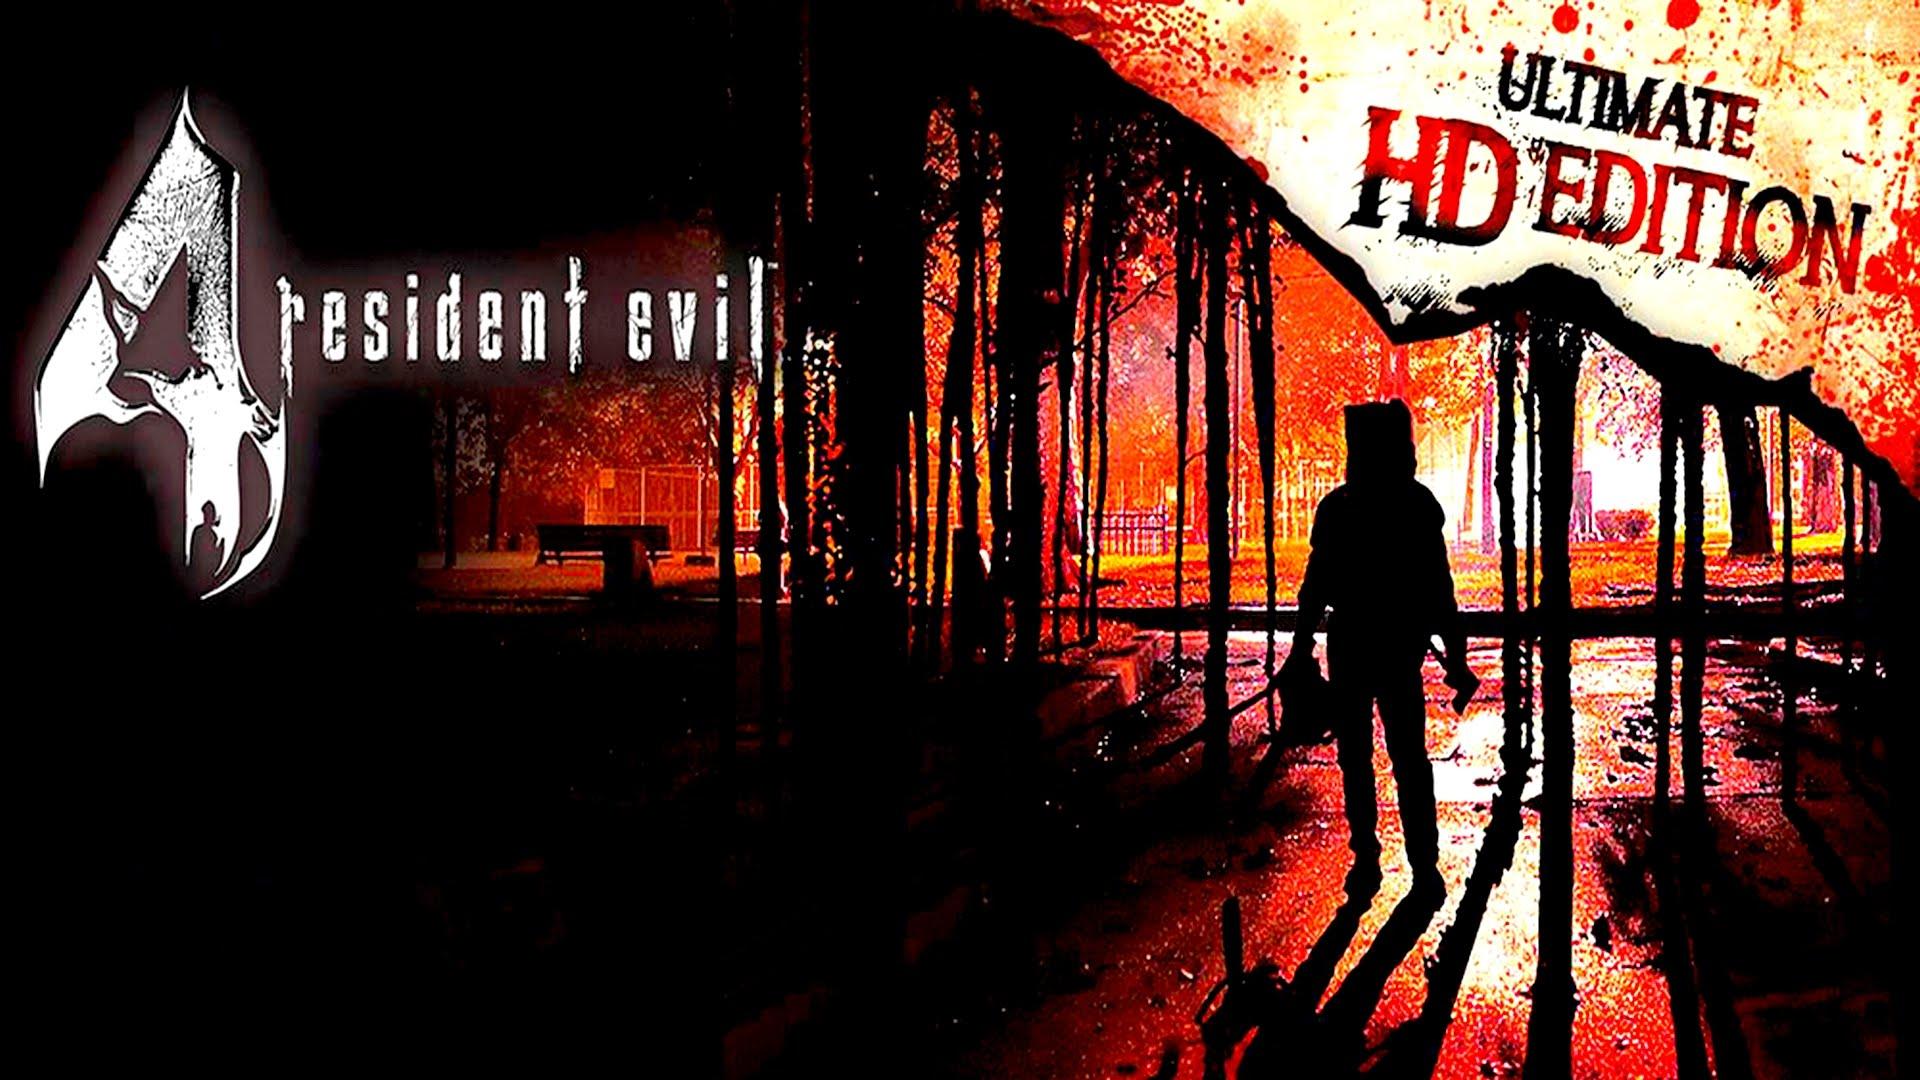 Постер Resident Evil 4 Ultimate HD Edition